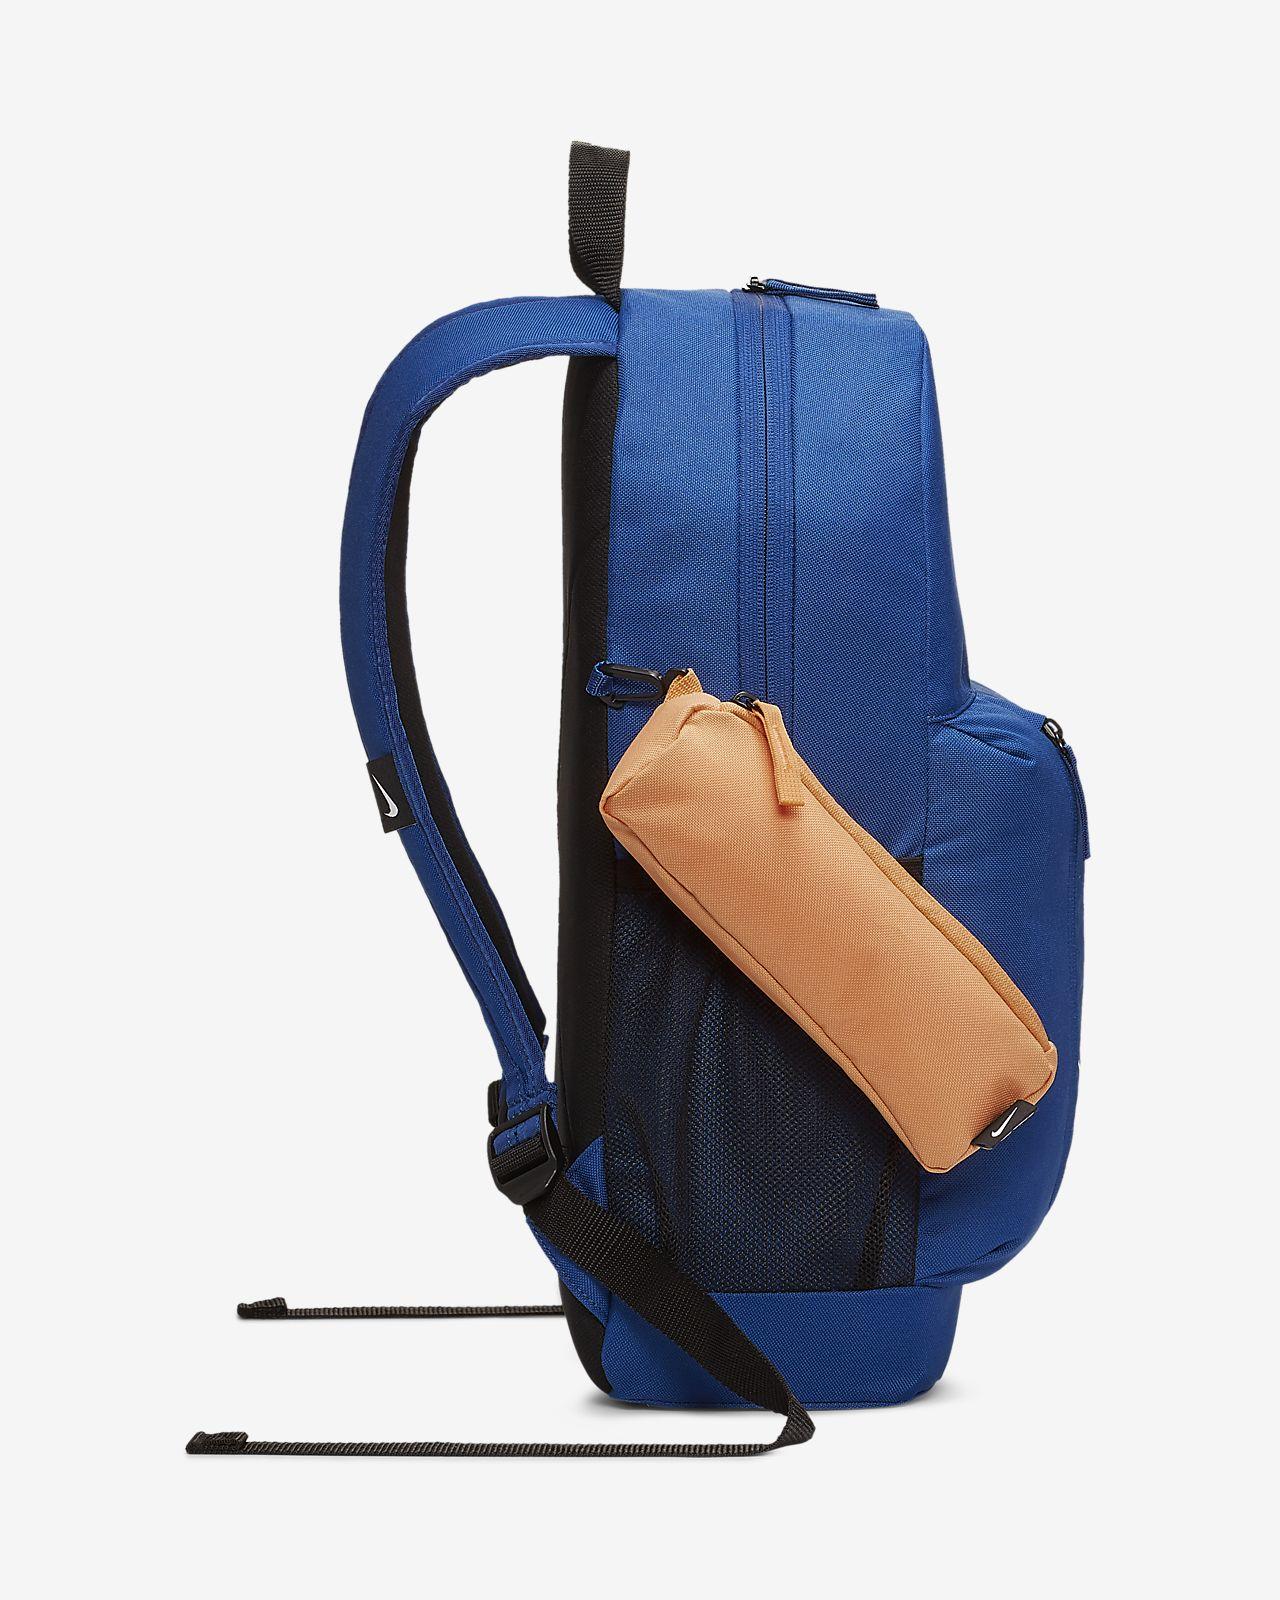 cc367e769f4 Low Resolution Nike Kids' Backpack Nike Kids' Backpack